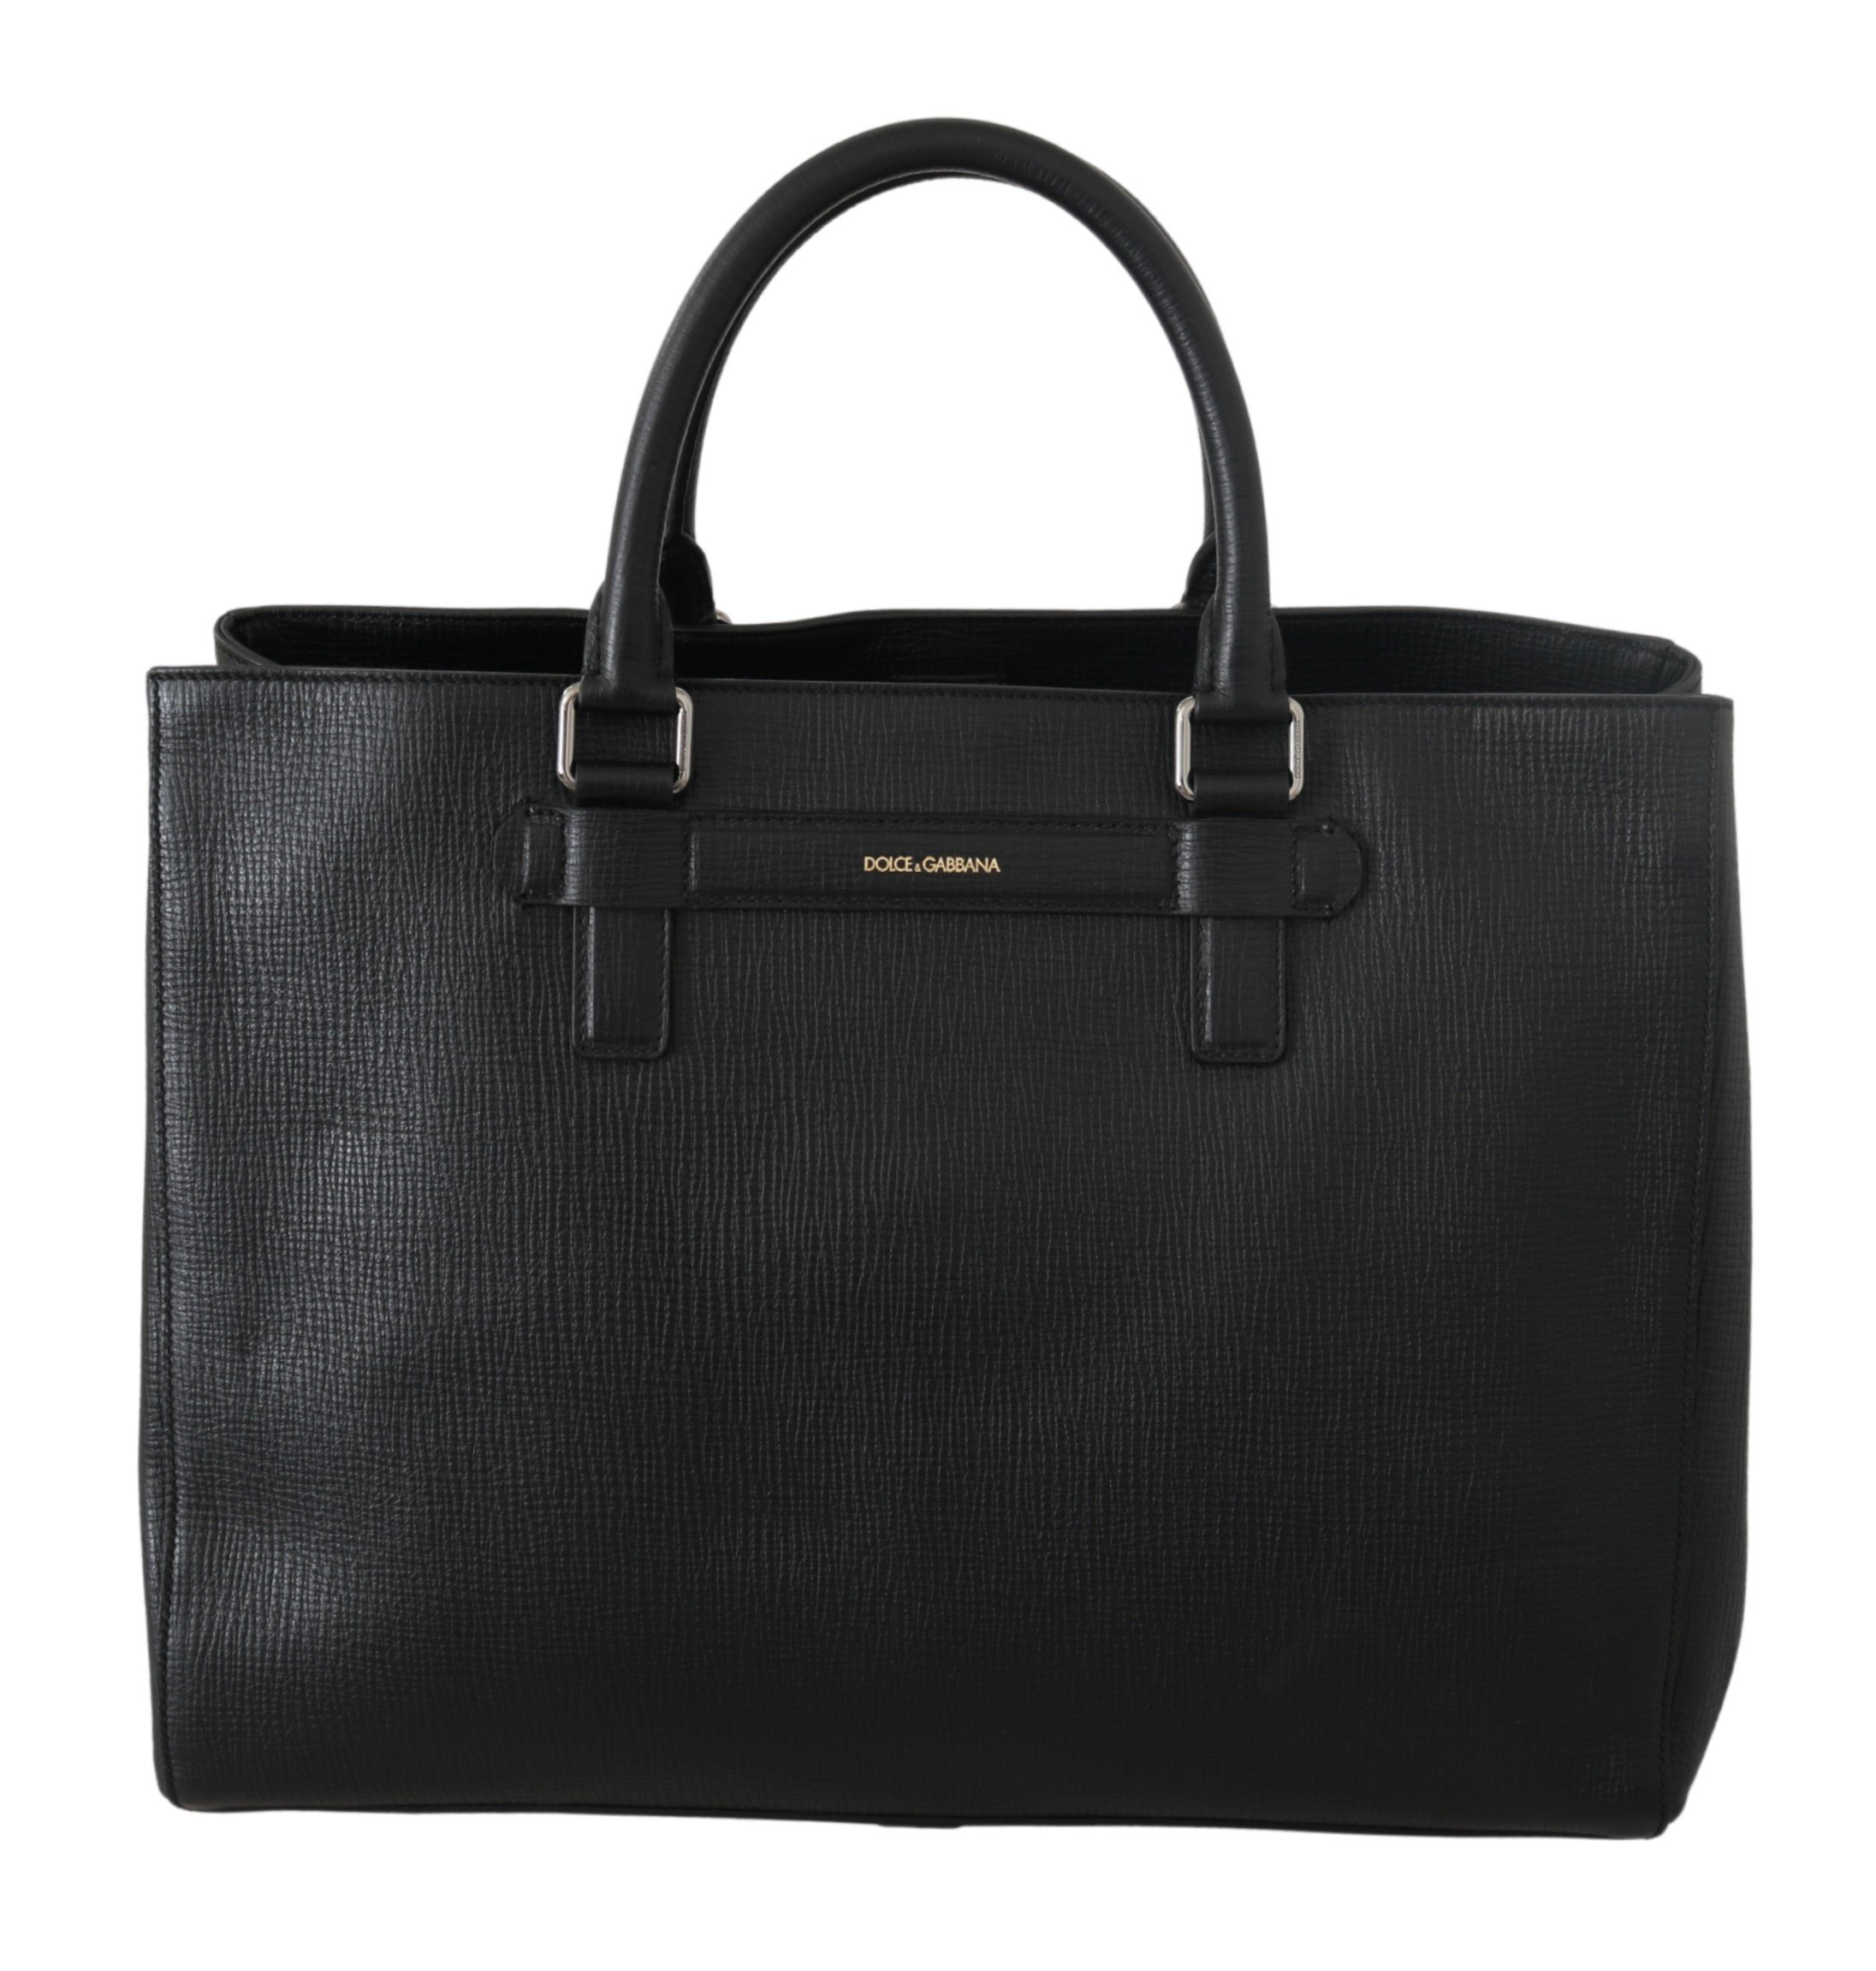 Dolce & Gabbana Men's Messenger Leather Travel Bag Black VAS9233